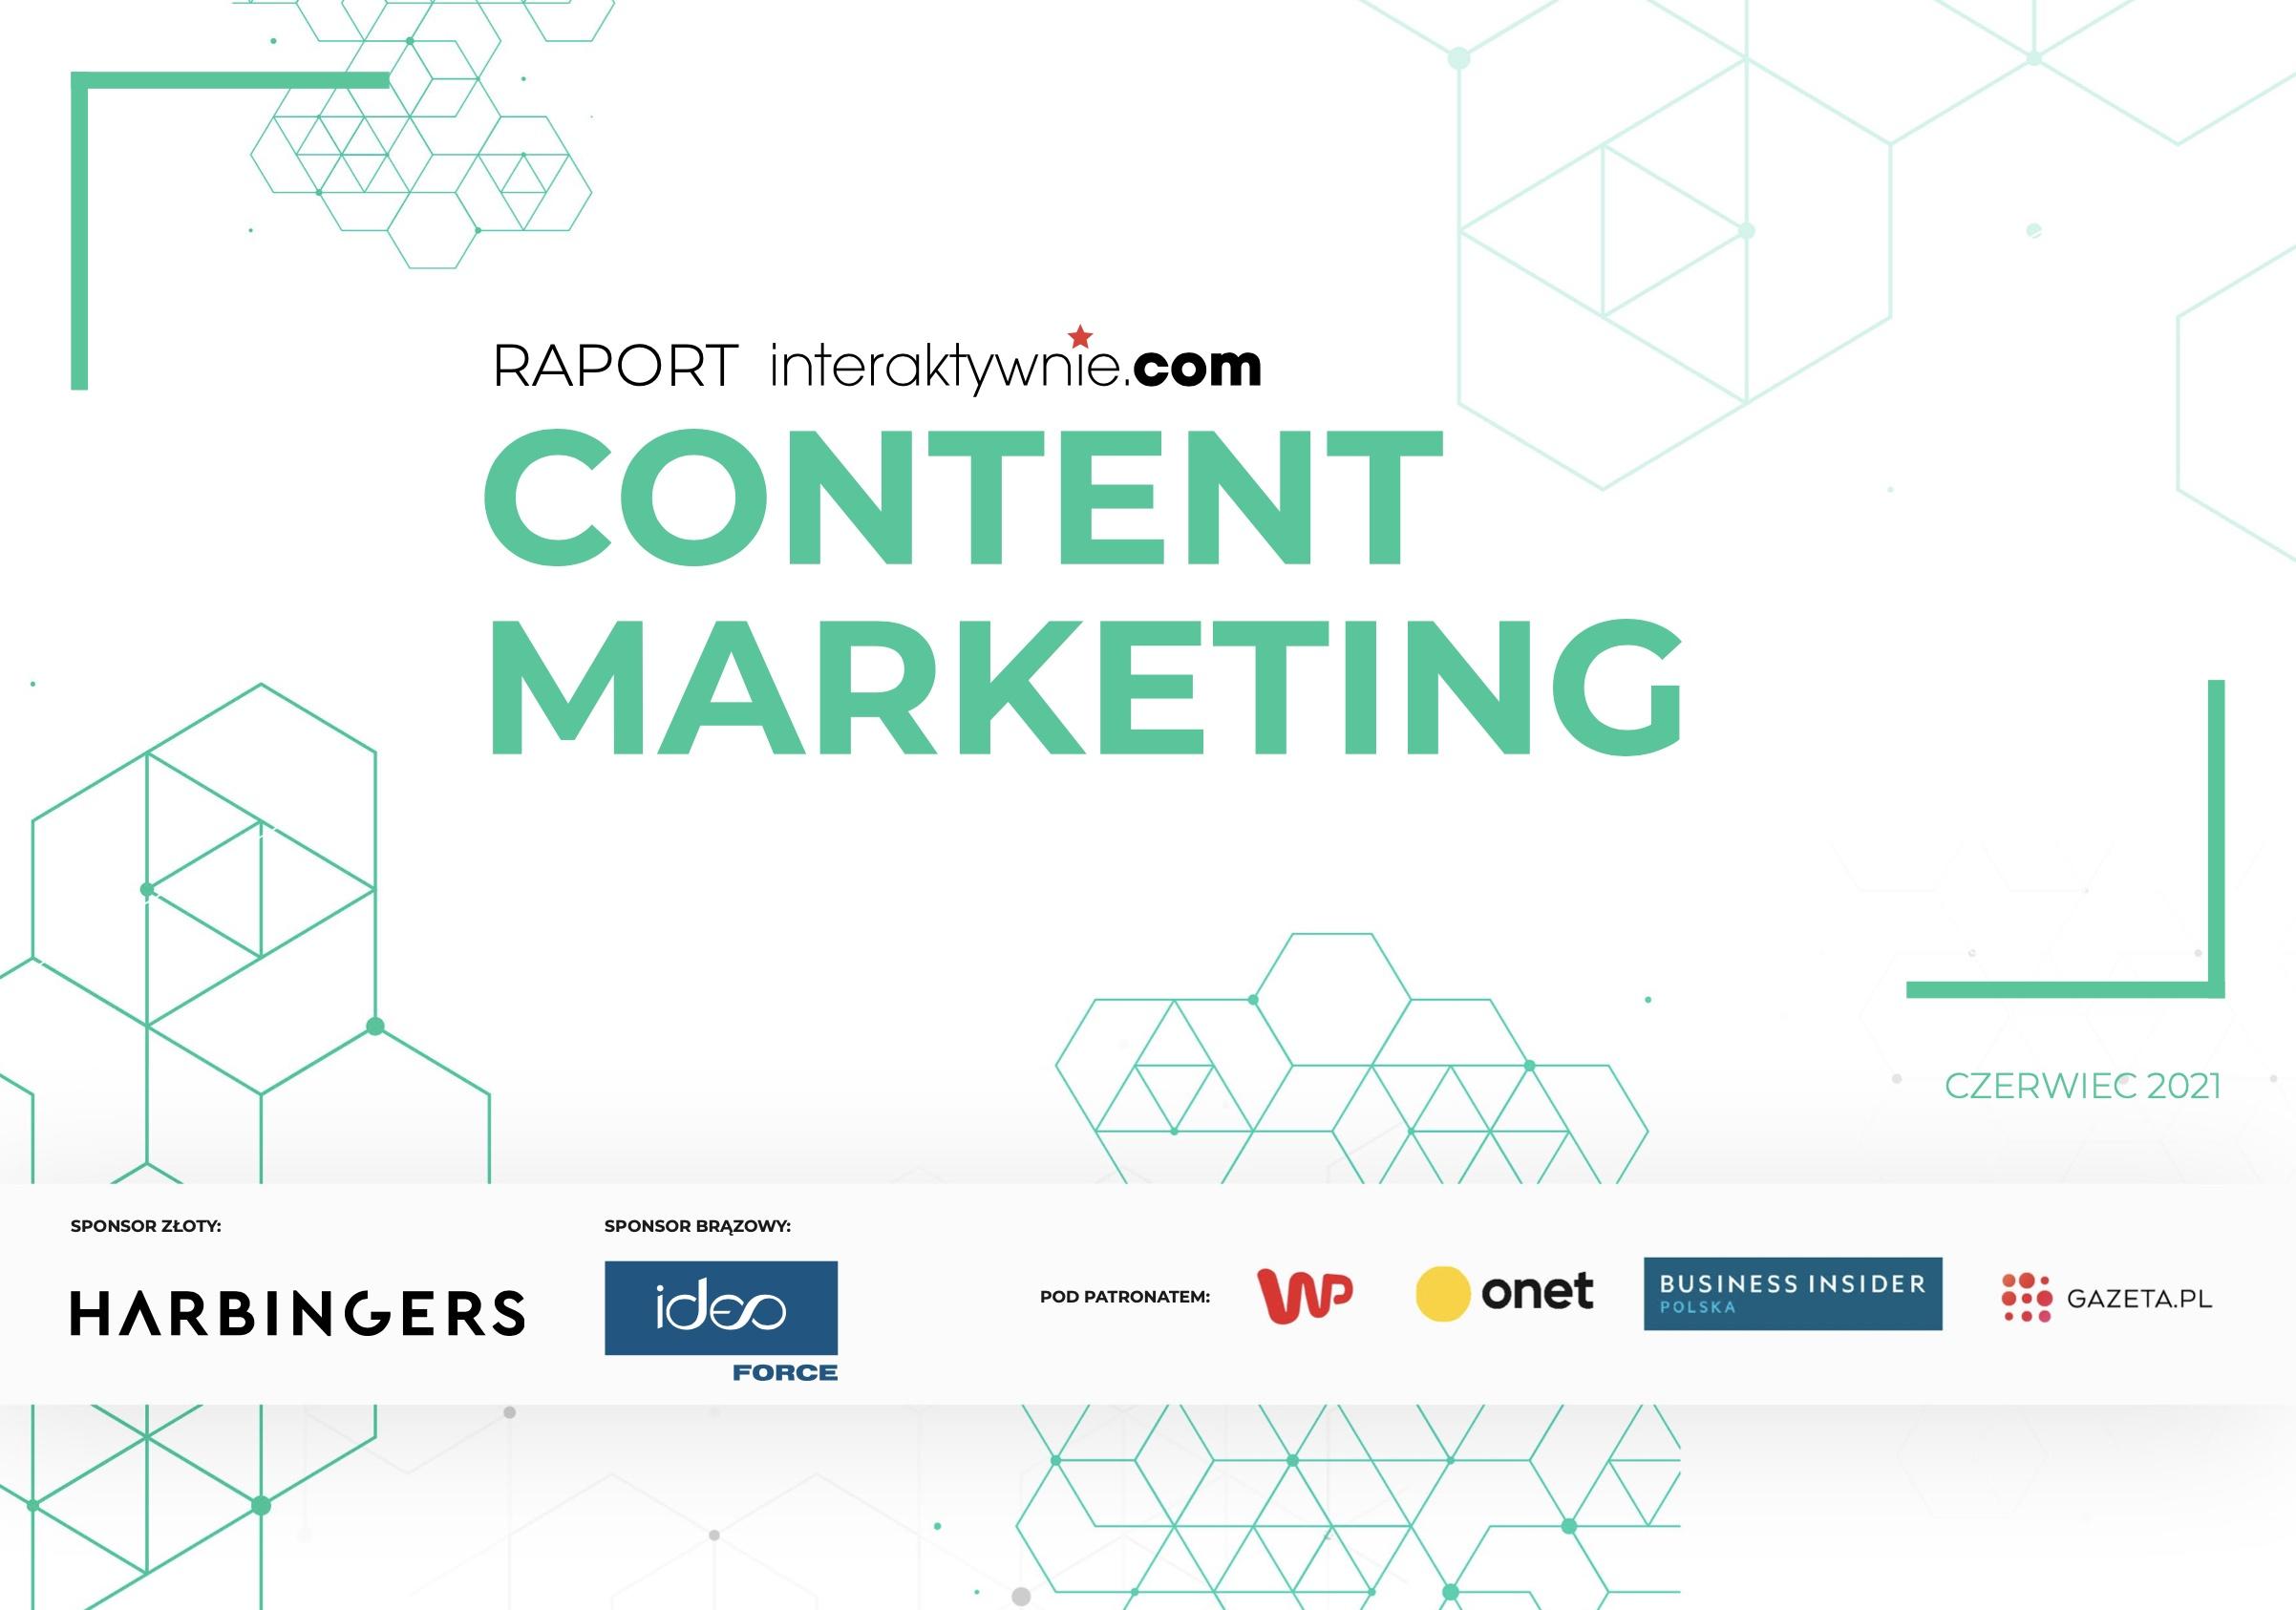 Agencje content marketingowe